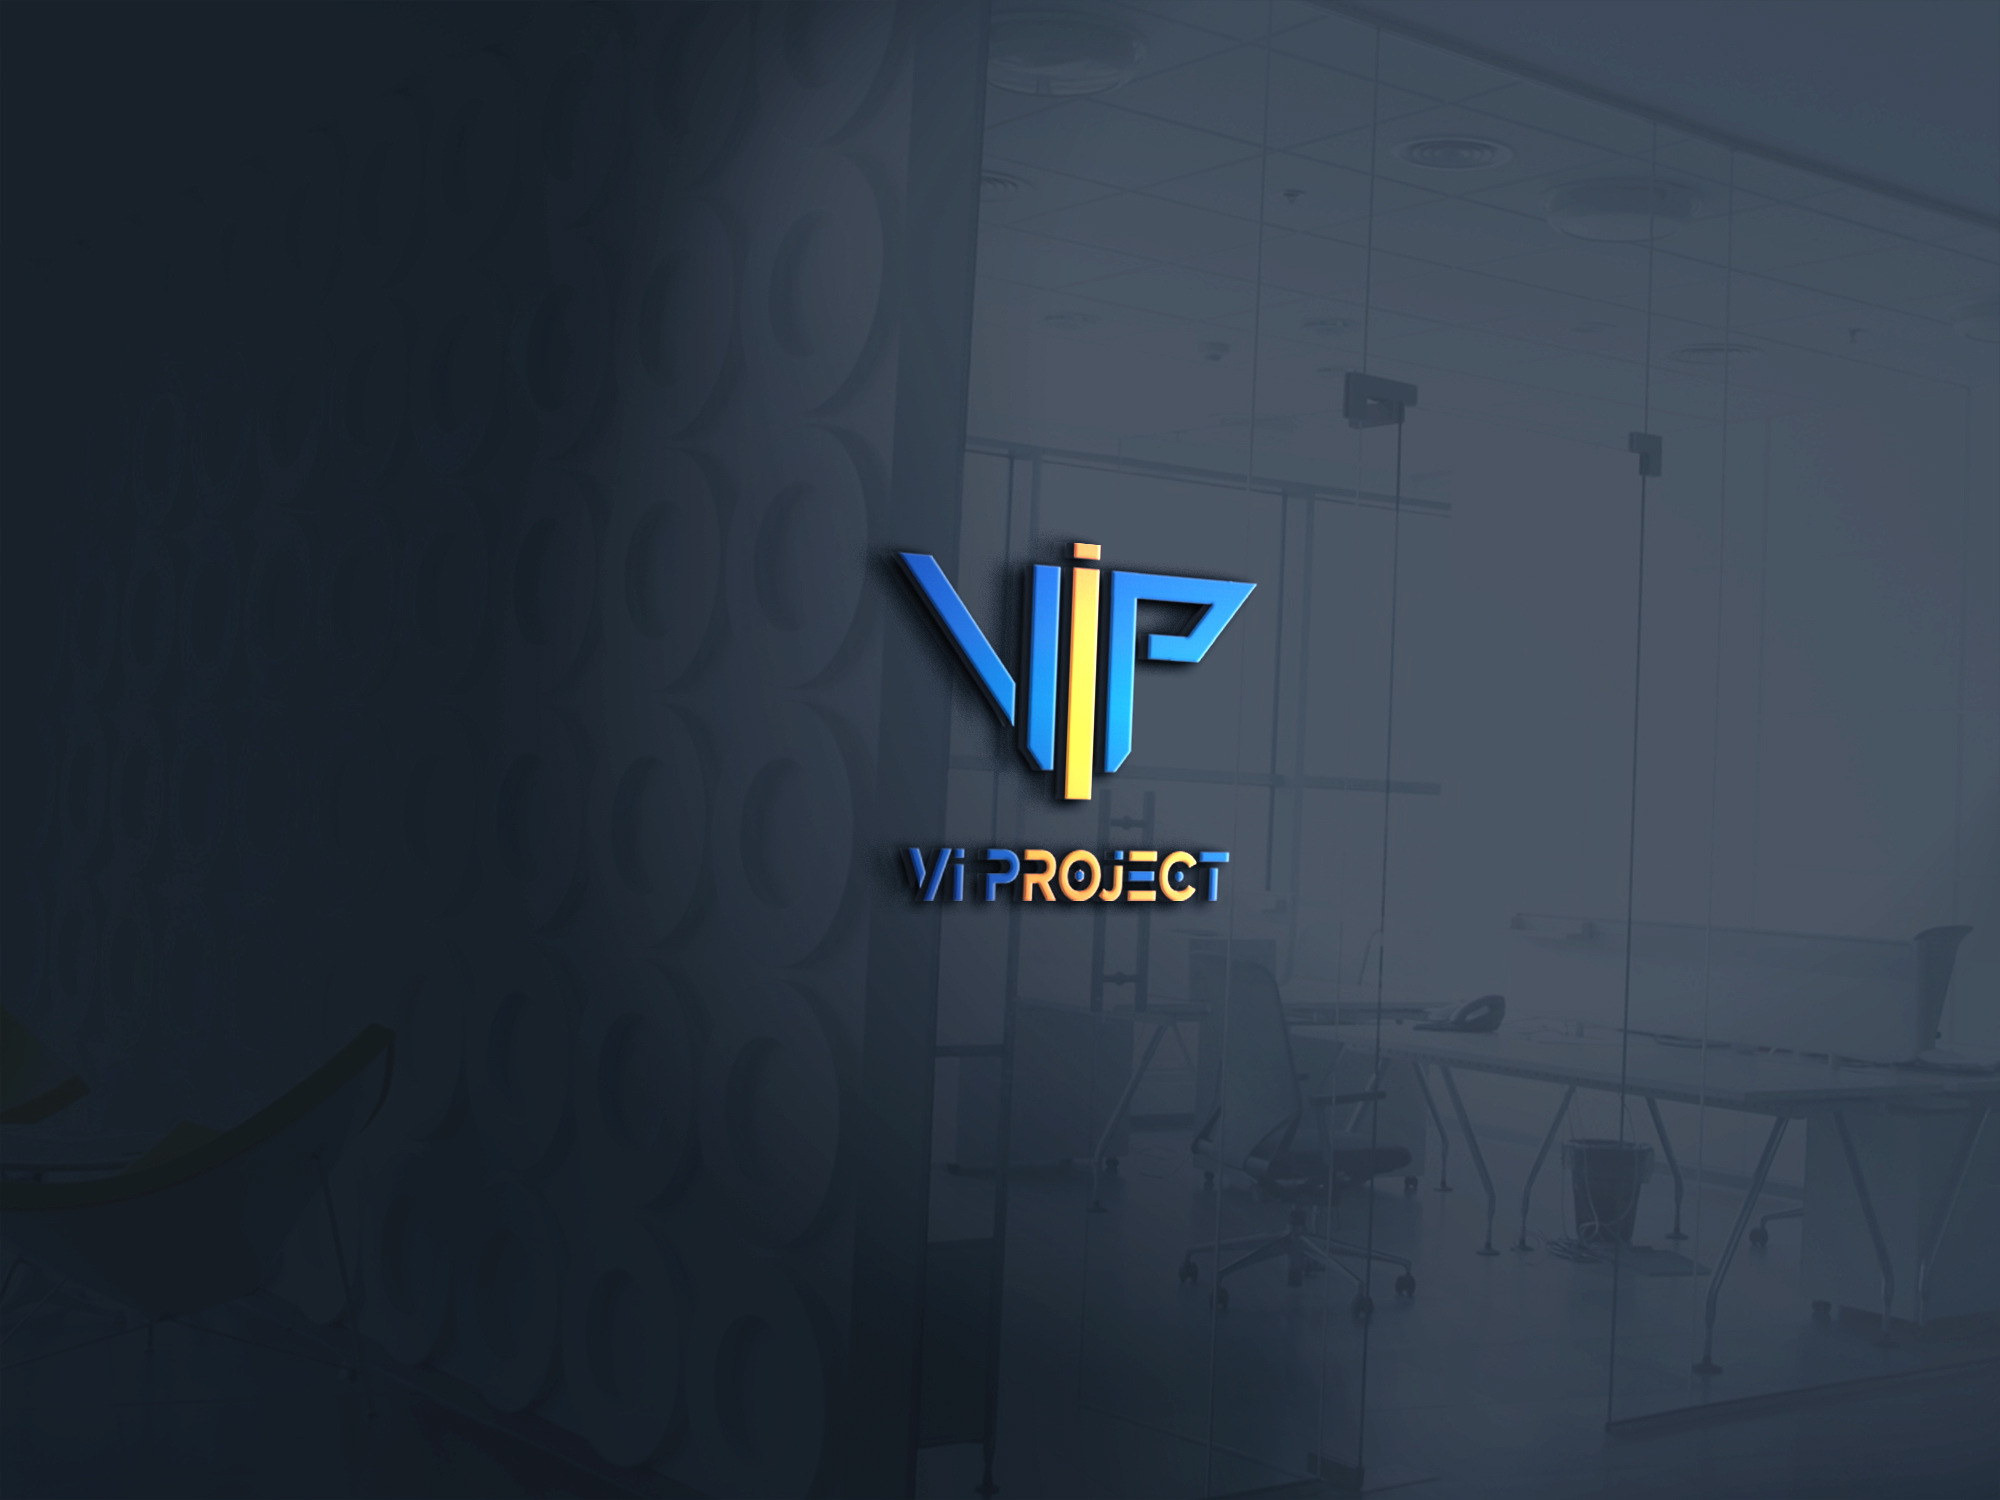 9320_VI_Project_logo_SA-mockup-01.jpg